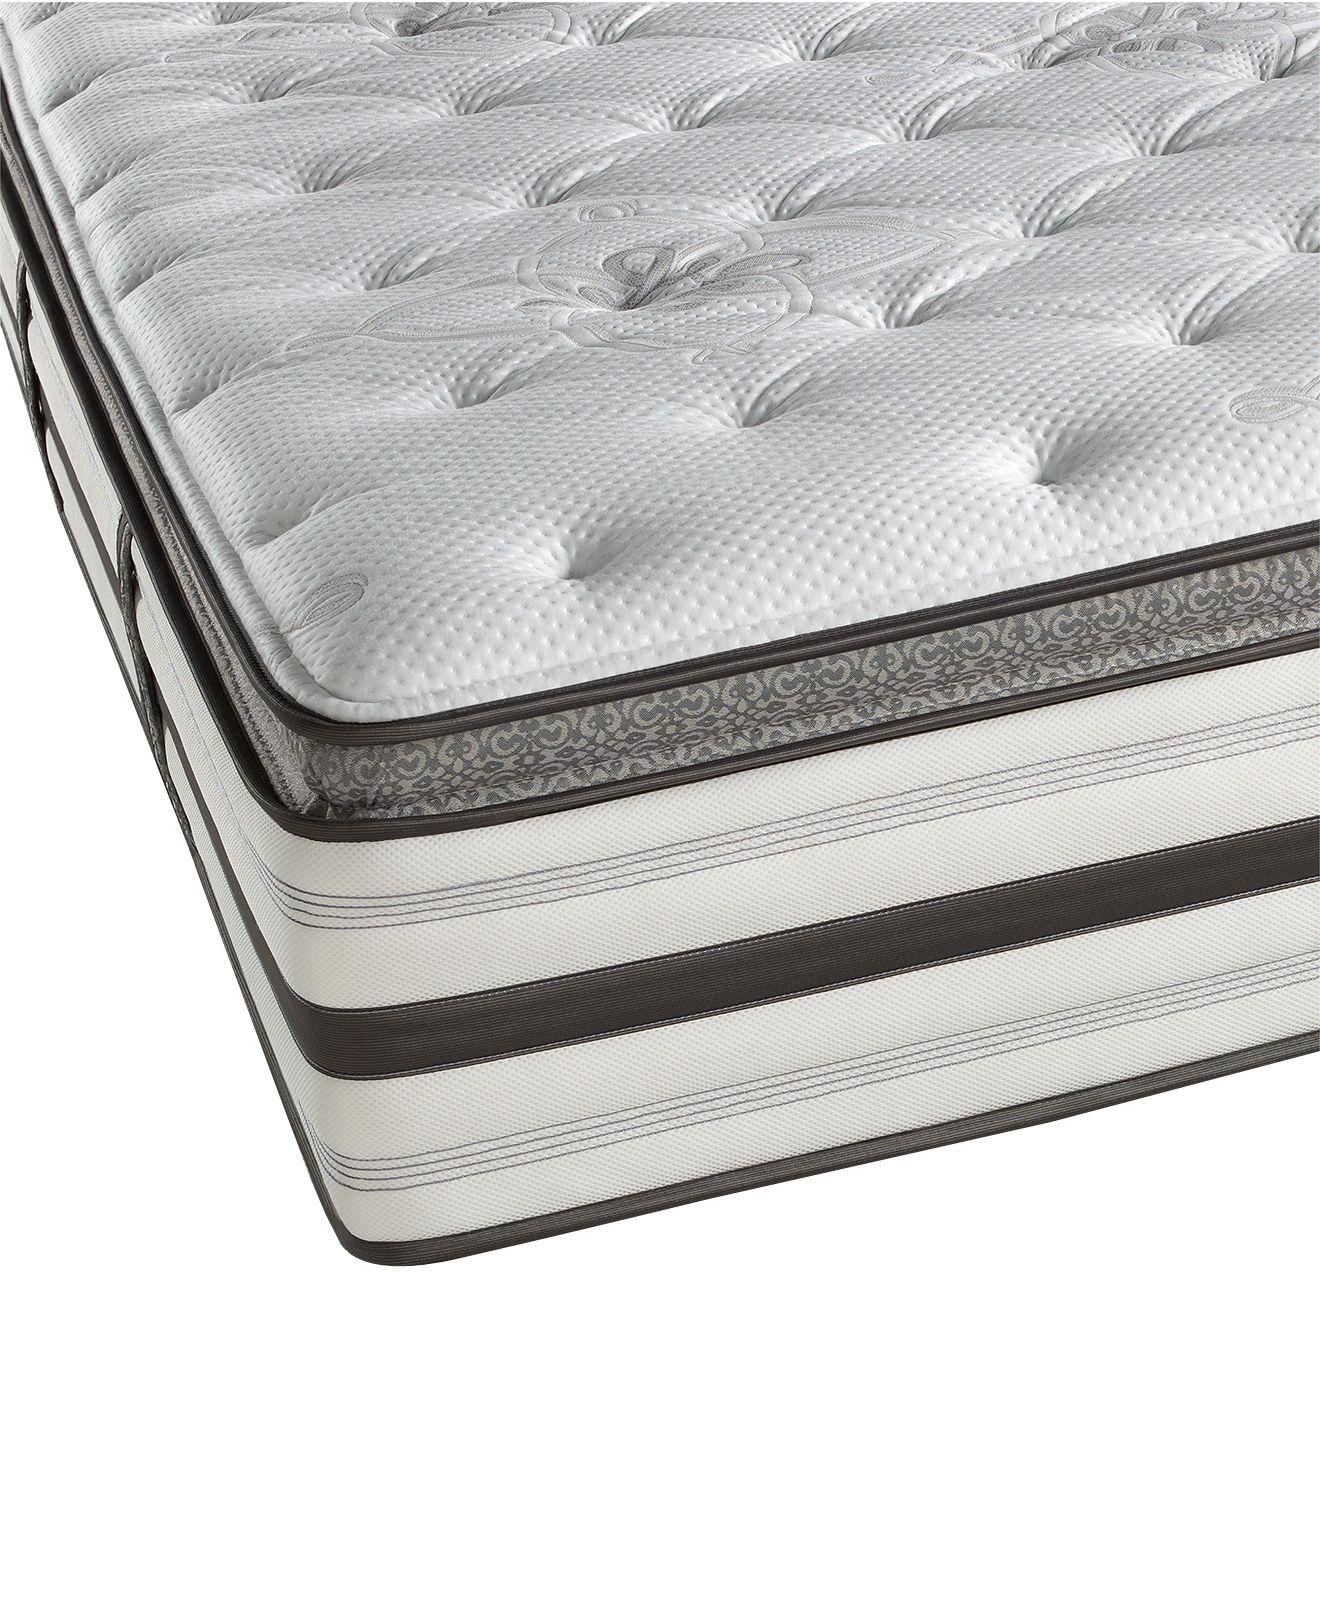 Simmons Beautyrest World Class Hollingsworth Luxury Firm Pillow